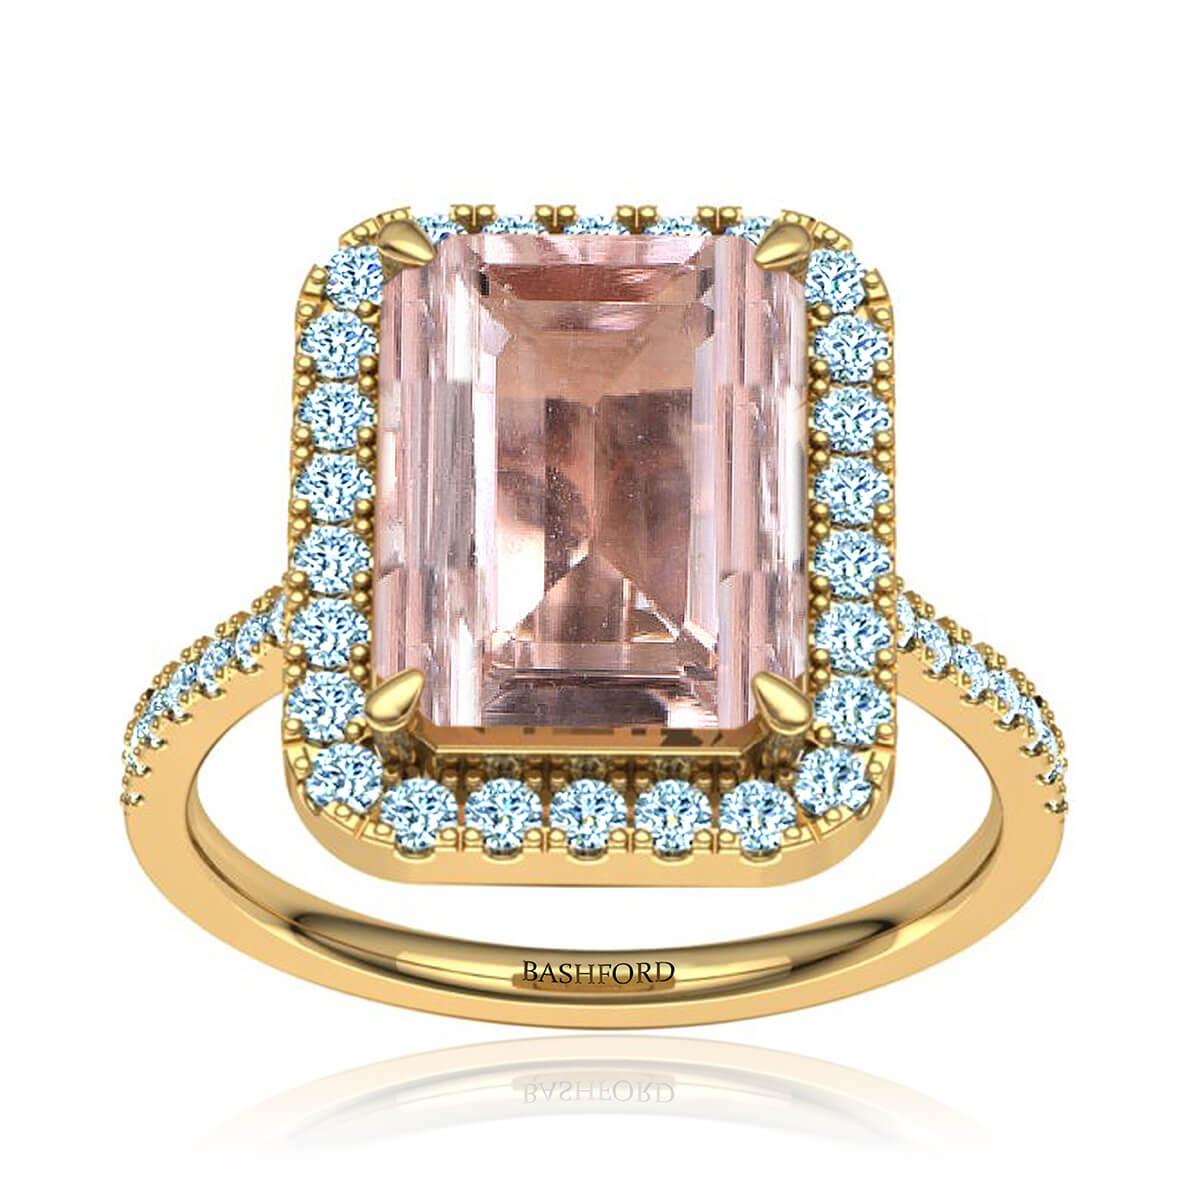 Elladora Morganite Ring (with 2 1/4 Carat Emerald Morganite)